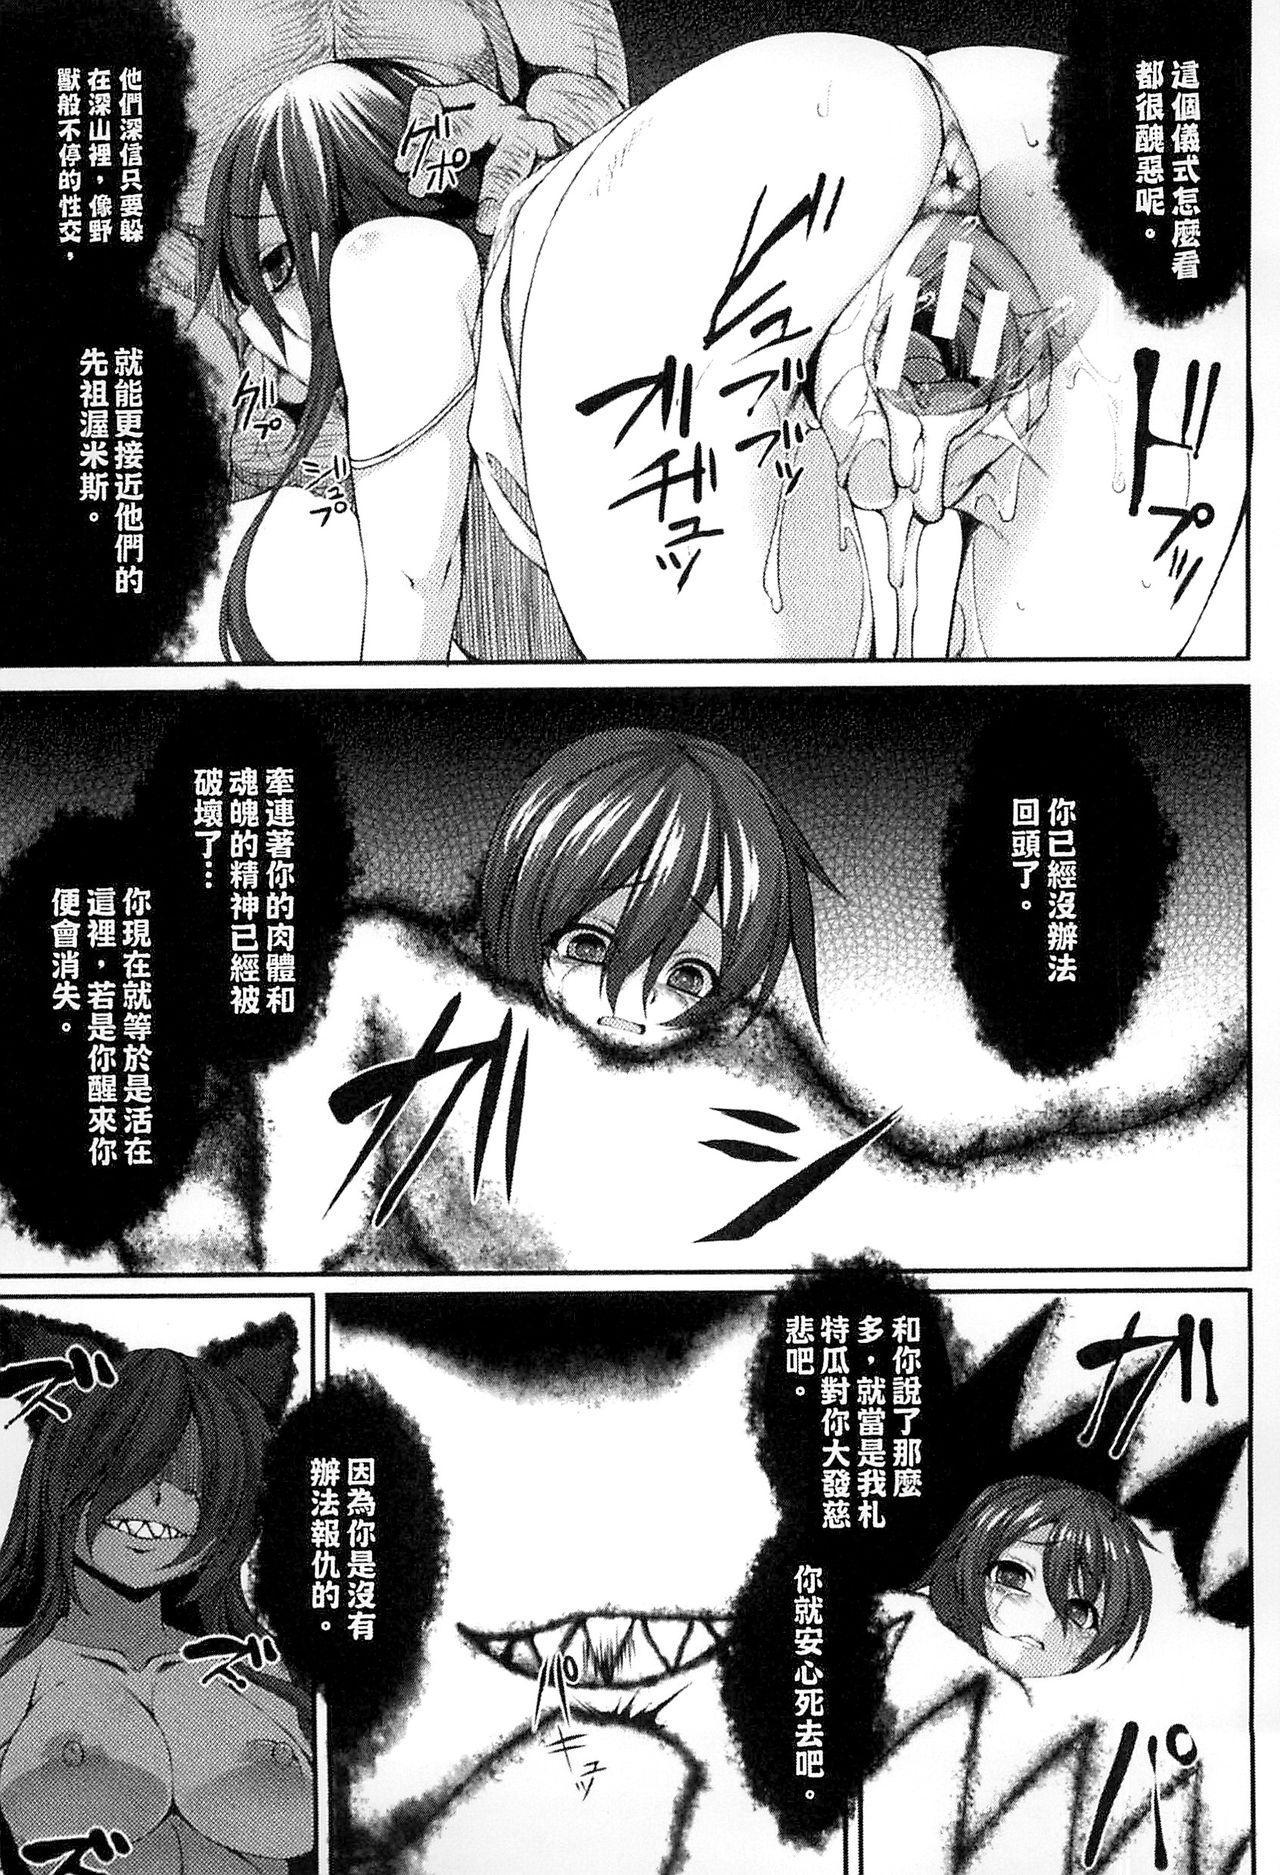 [Takayuki Hiyori] Aiyoku Gensou no Kai ~Cthulhu Pregnant~   愛欲幻想之怪 -克蘇魯- [Chinese] 47